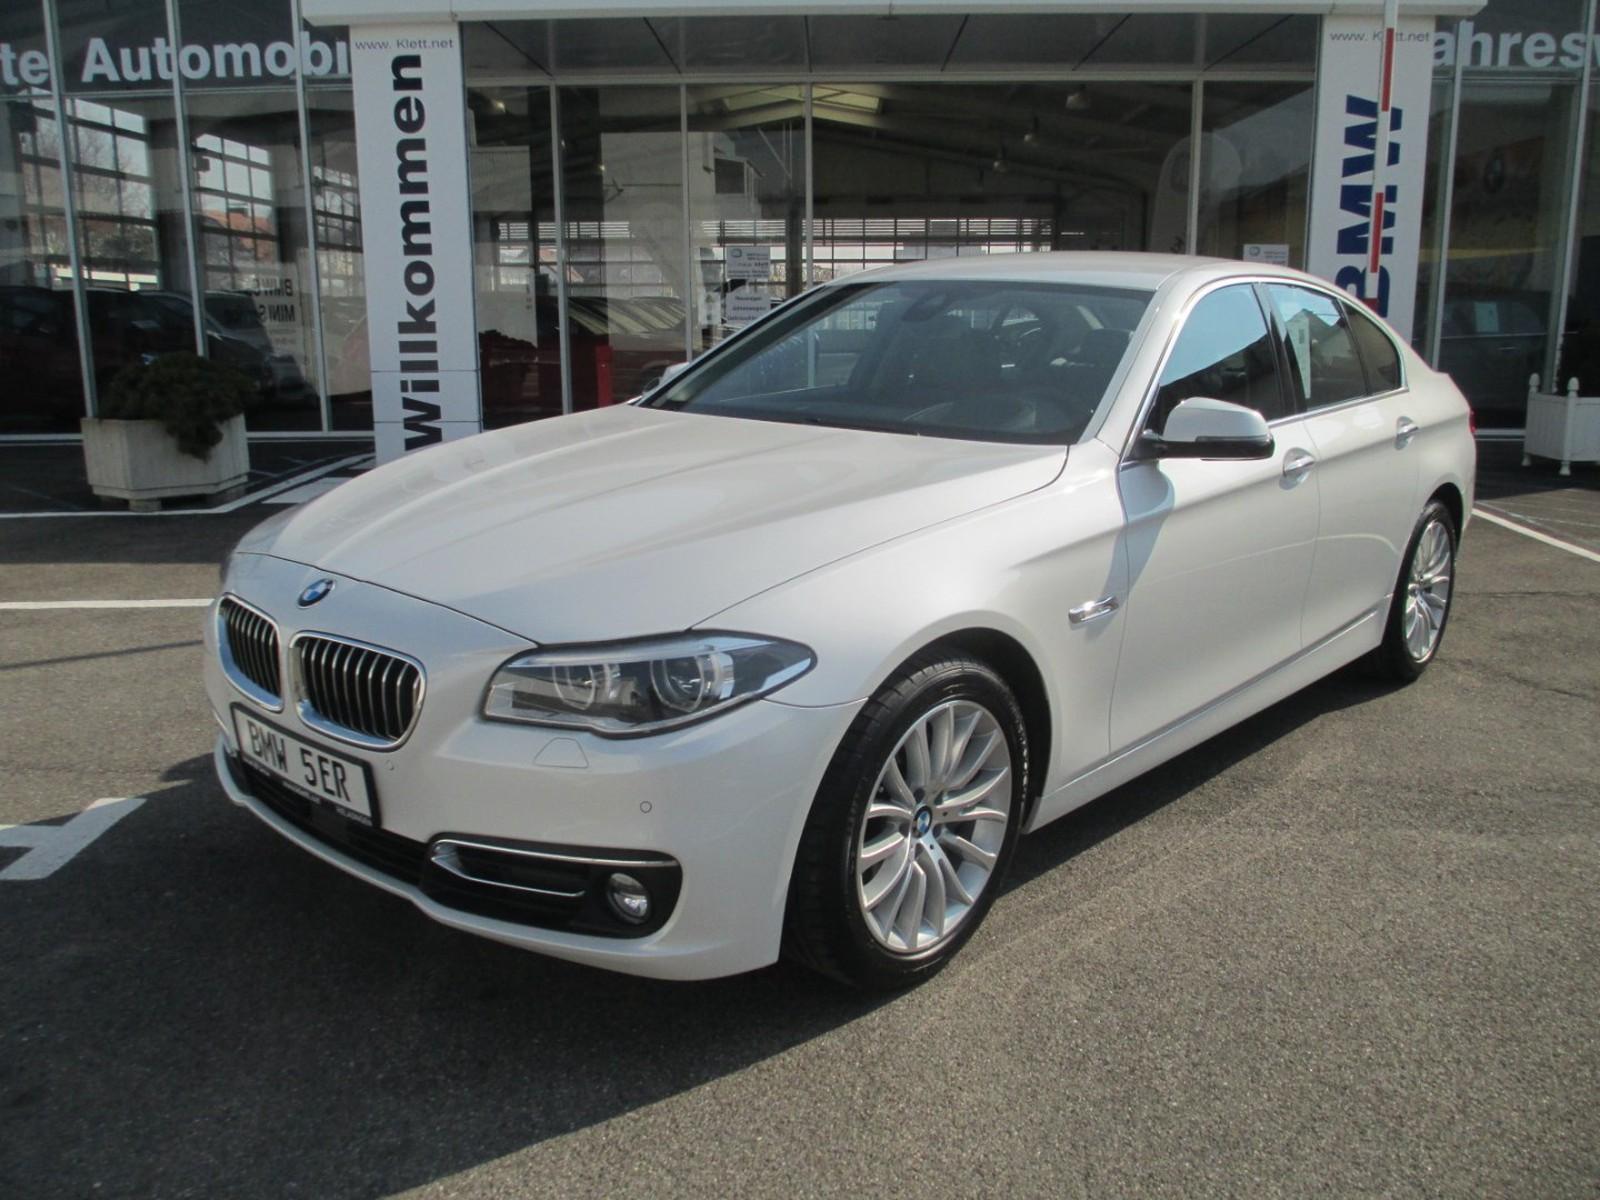 Bmw 535 I Xdrive A Luxury Line Used Buy In Rielasingen Worblingen Price 33000 Eur Int Nr 180714 Sold